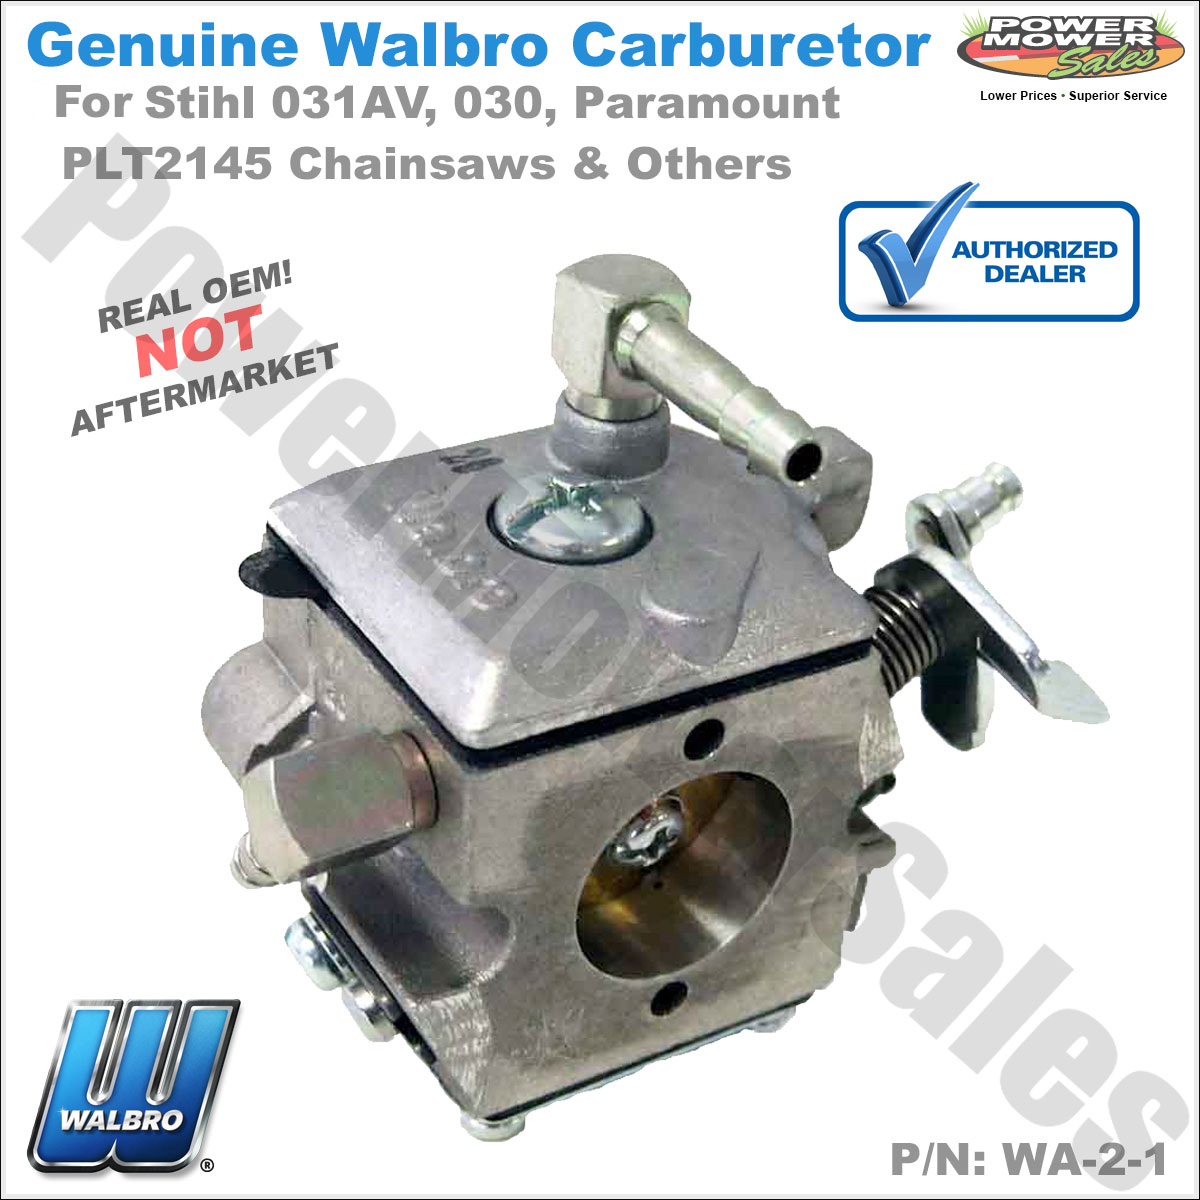 Gaskets Carburetor For Walbro WA-2-1 Stihl 031AV 030 Paramount PLT2145 Chainsaw